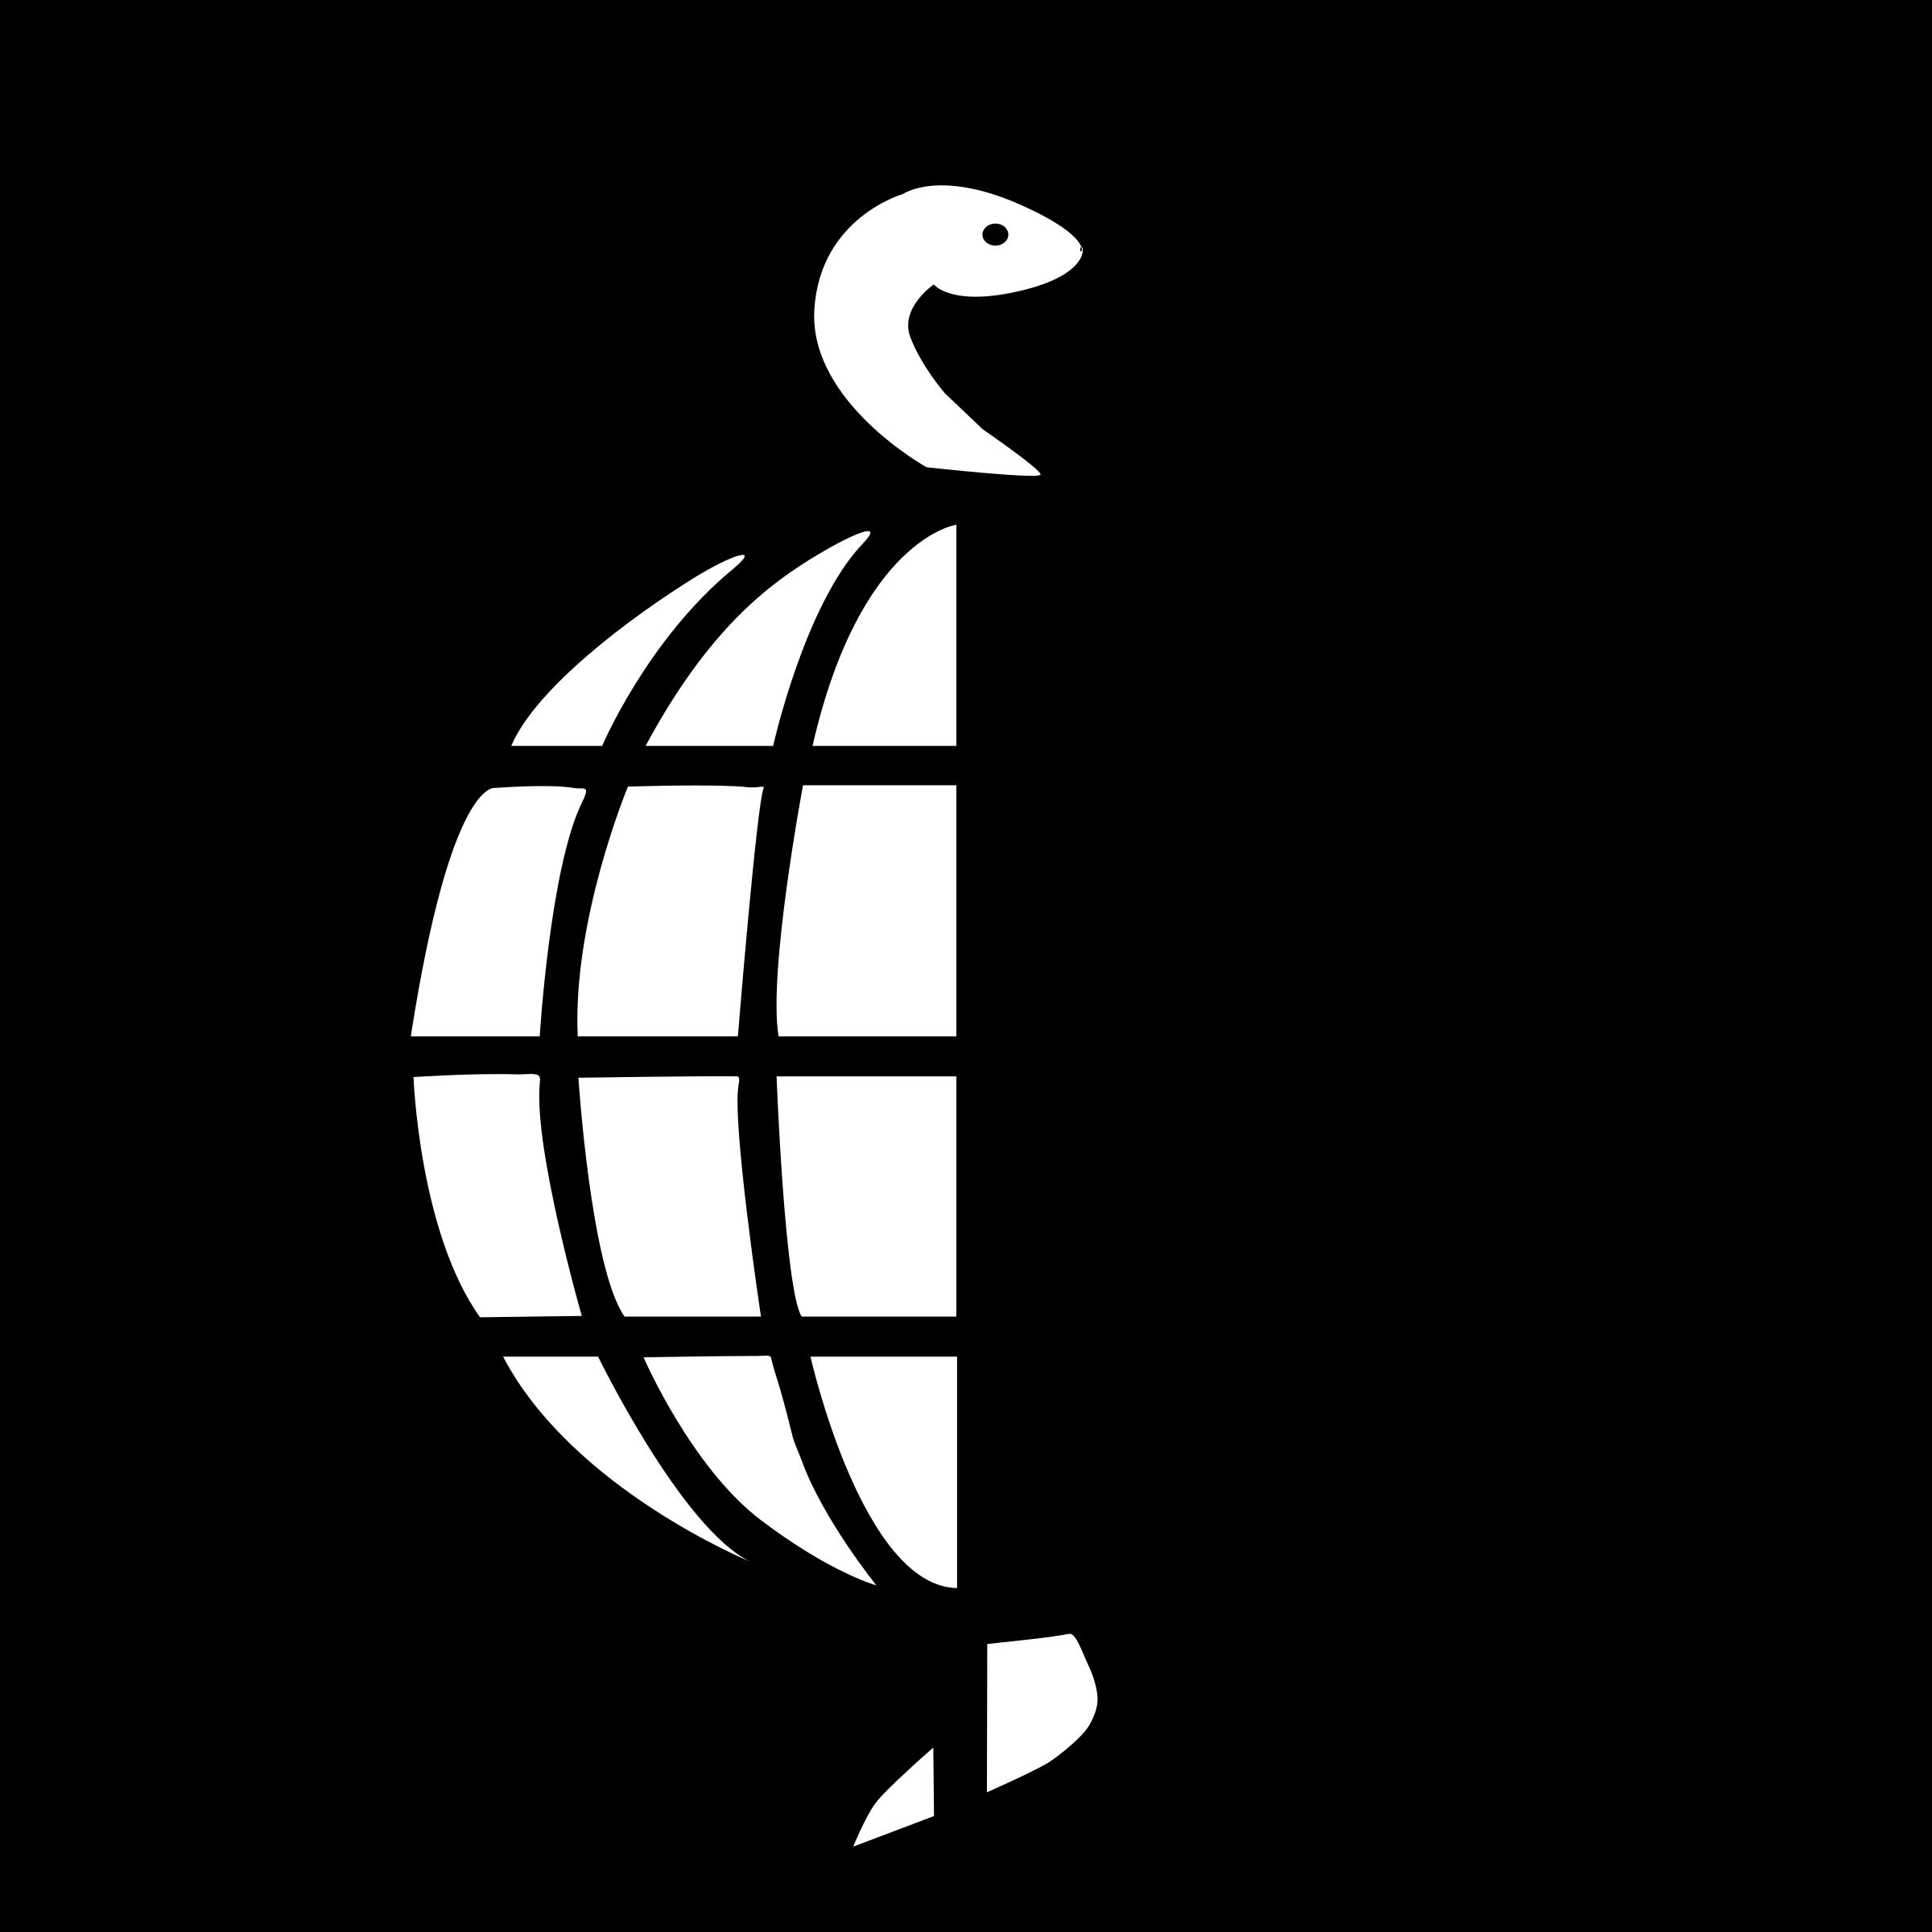 FA Davis Logo PNG Transparent & SVG Vector.